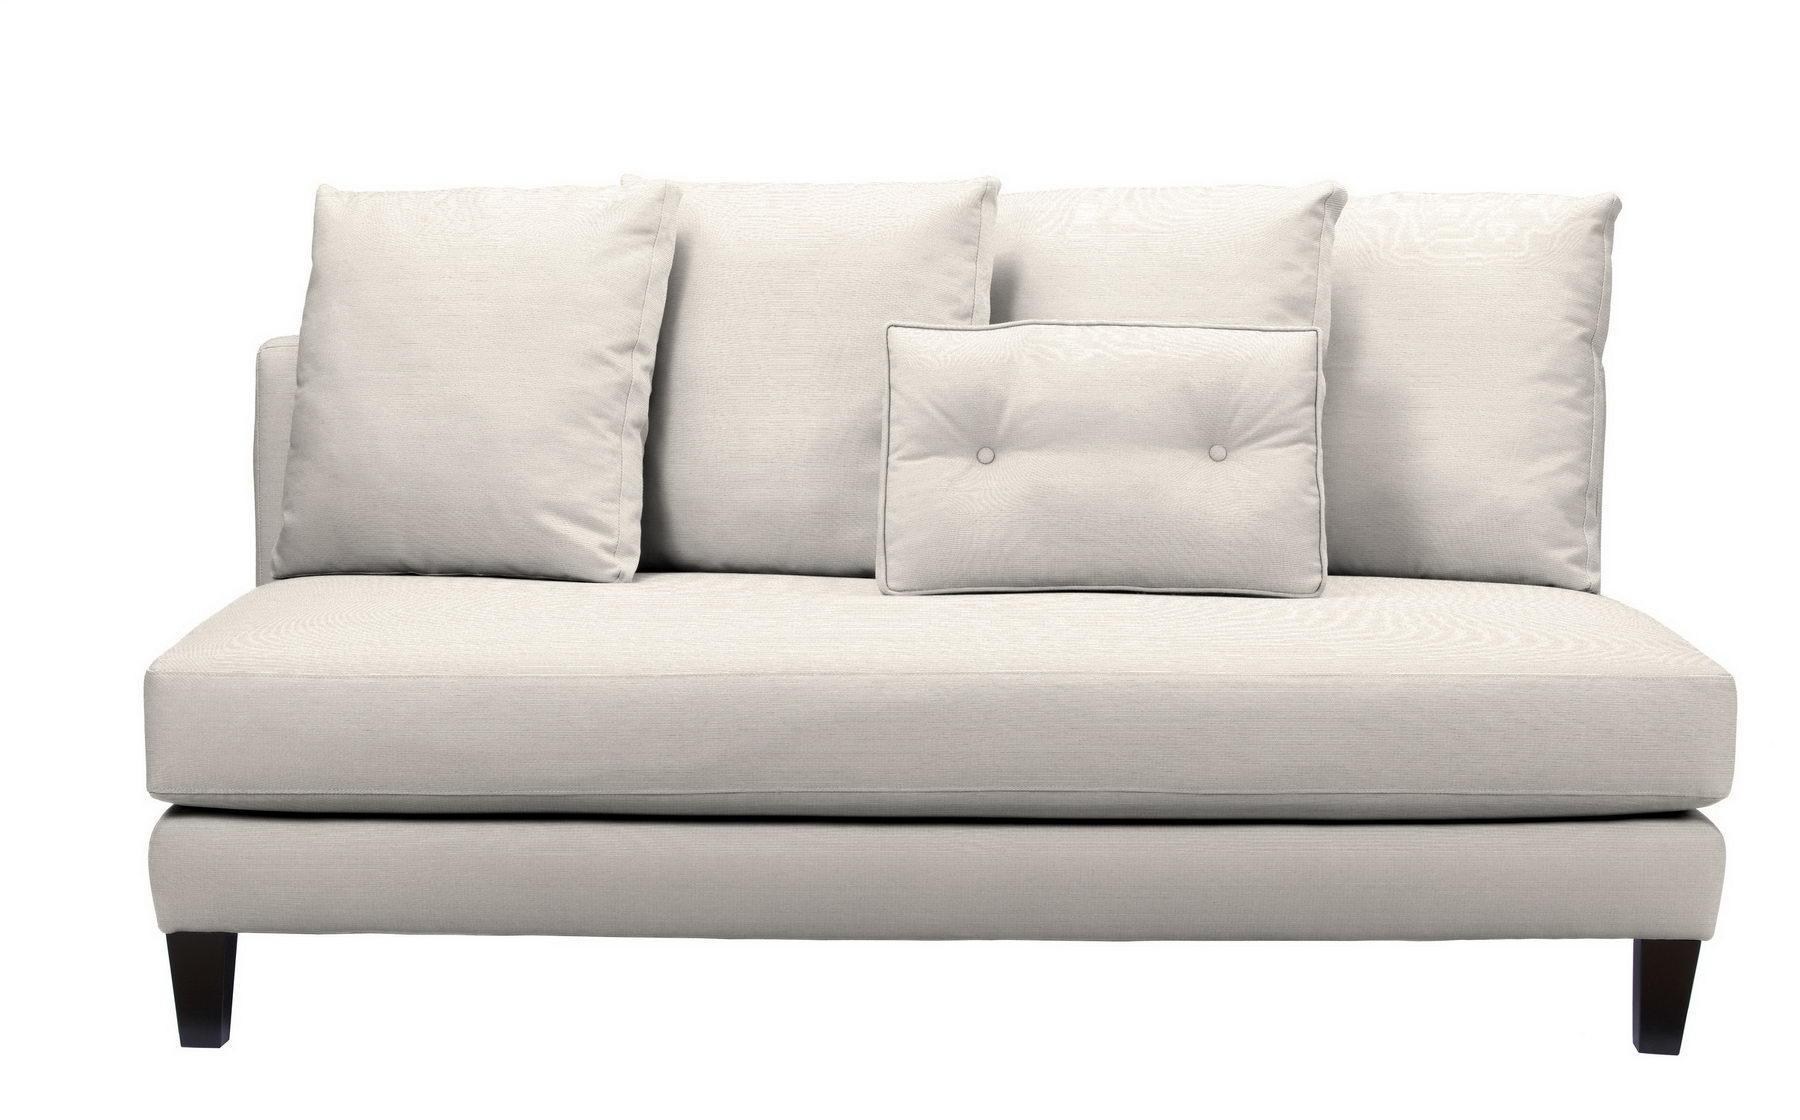 Harbor House COAST不带扶手两人沙发10155905041015590504